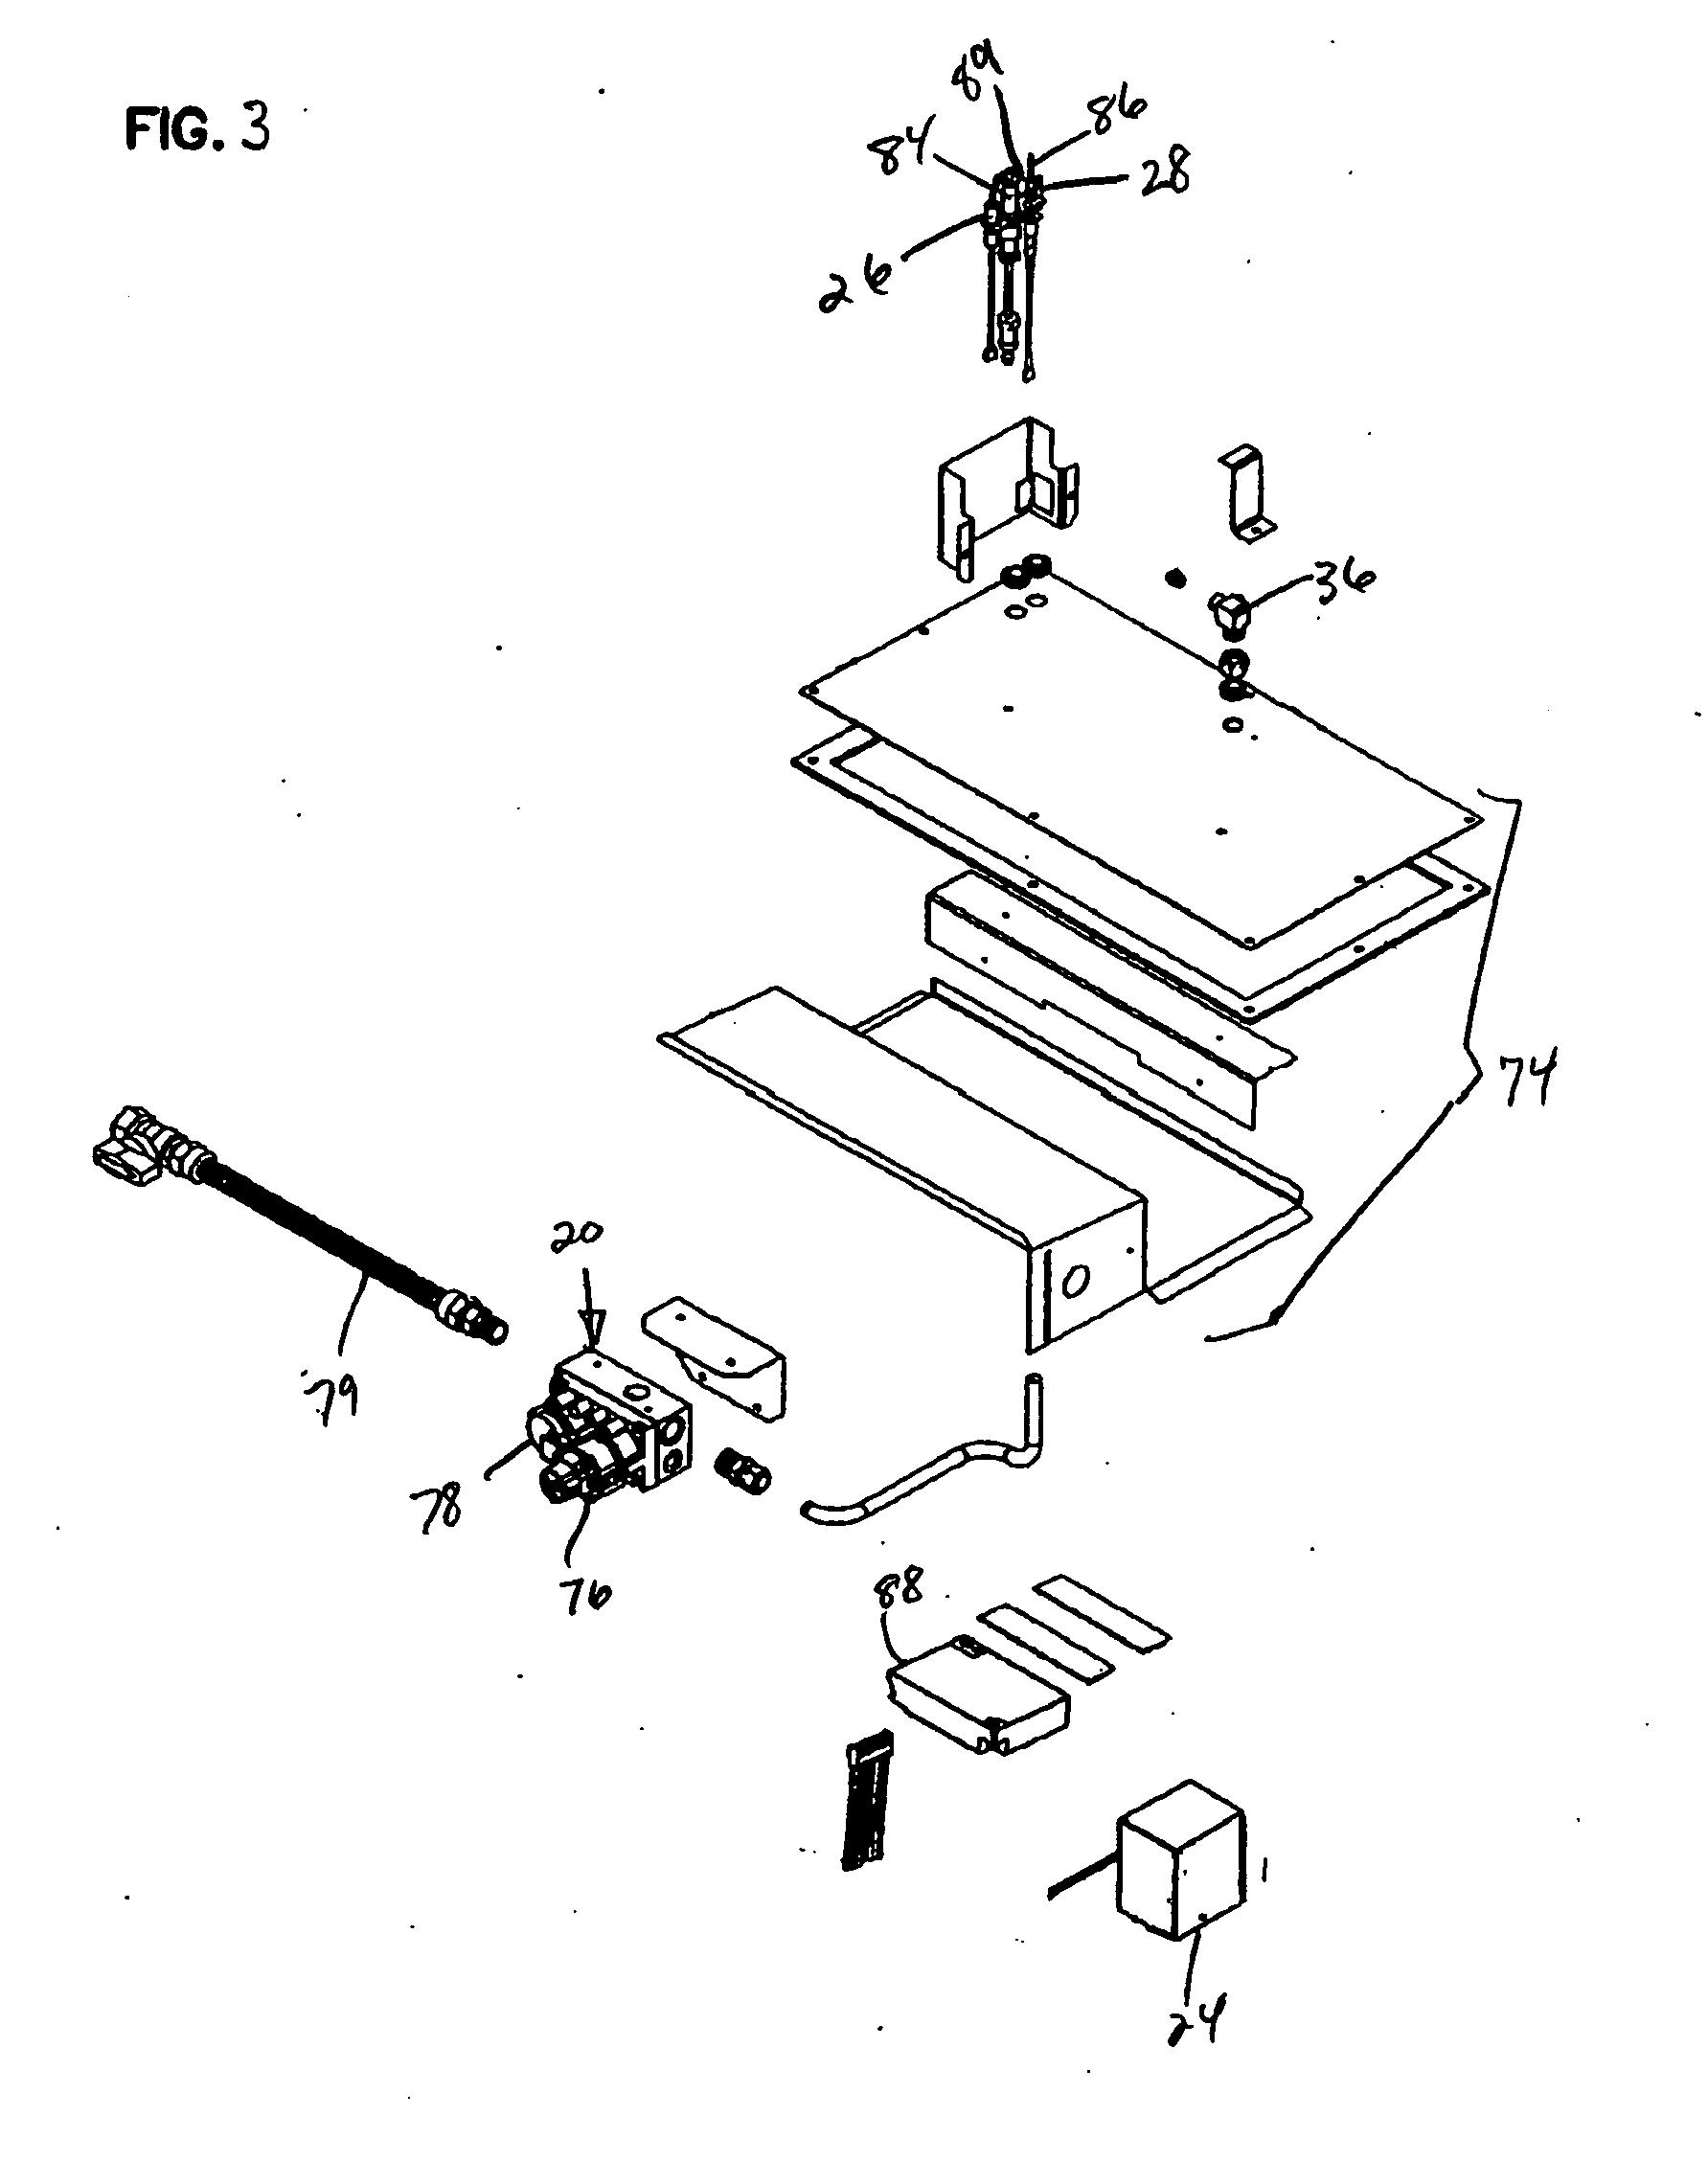 hight resolution of leviton ip710 dlz wiring diagram imageresizertool com leviton dimmers wiring diagrams leviton 3 way dimmer switch wiring diagram